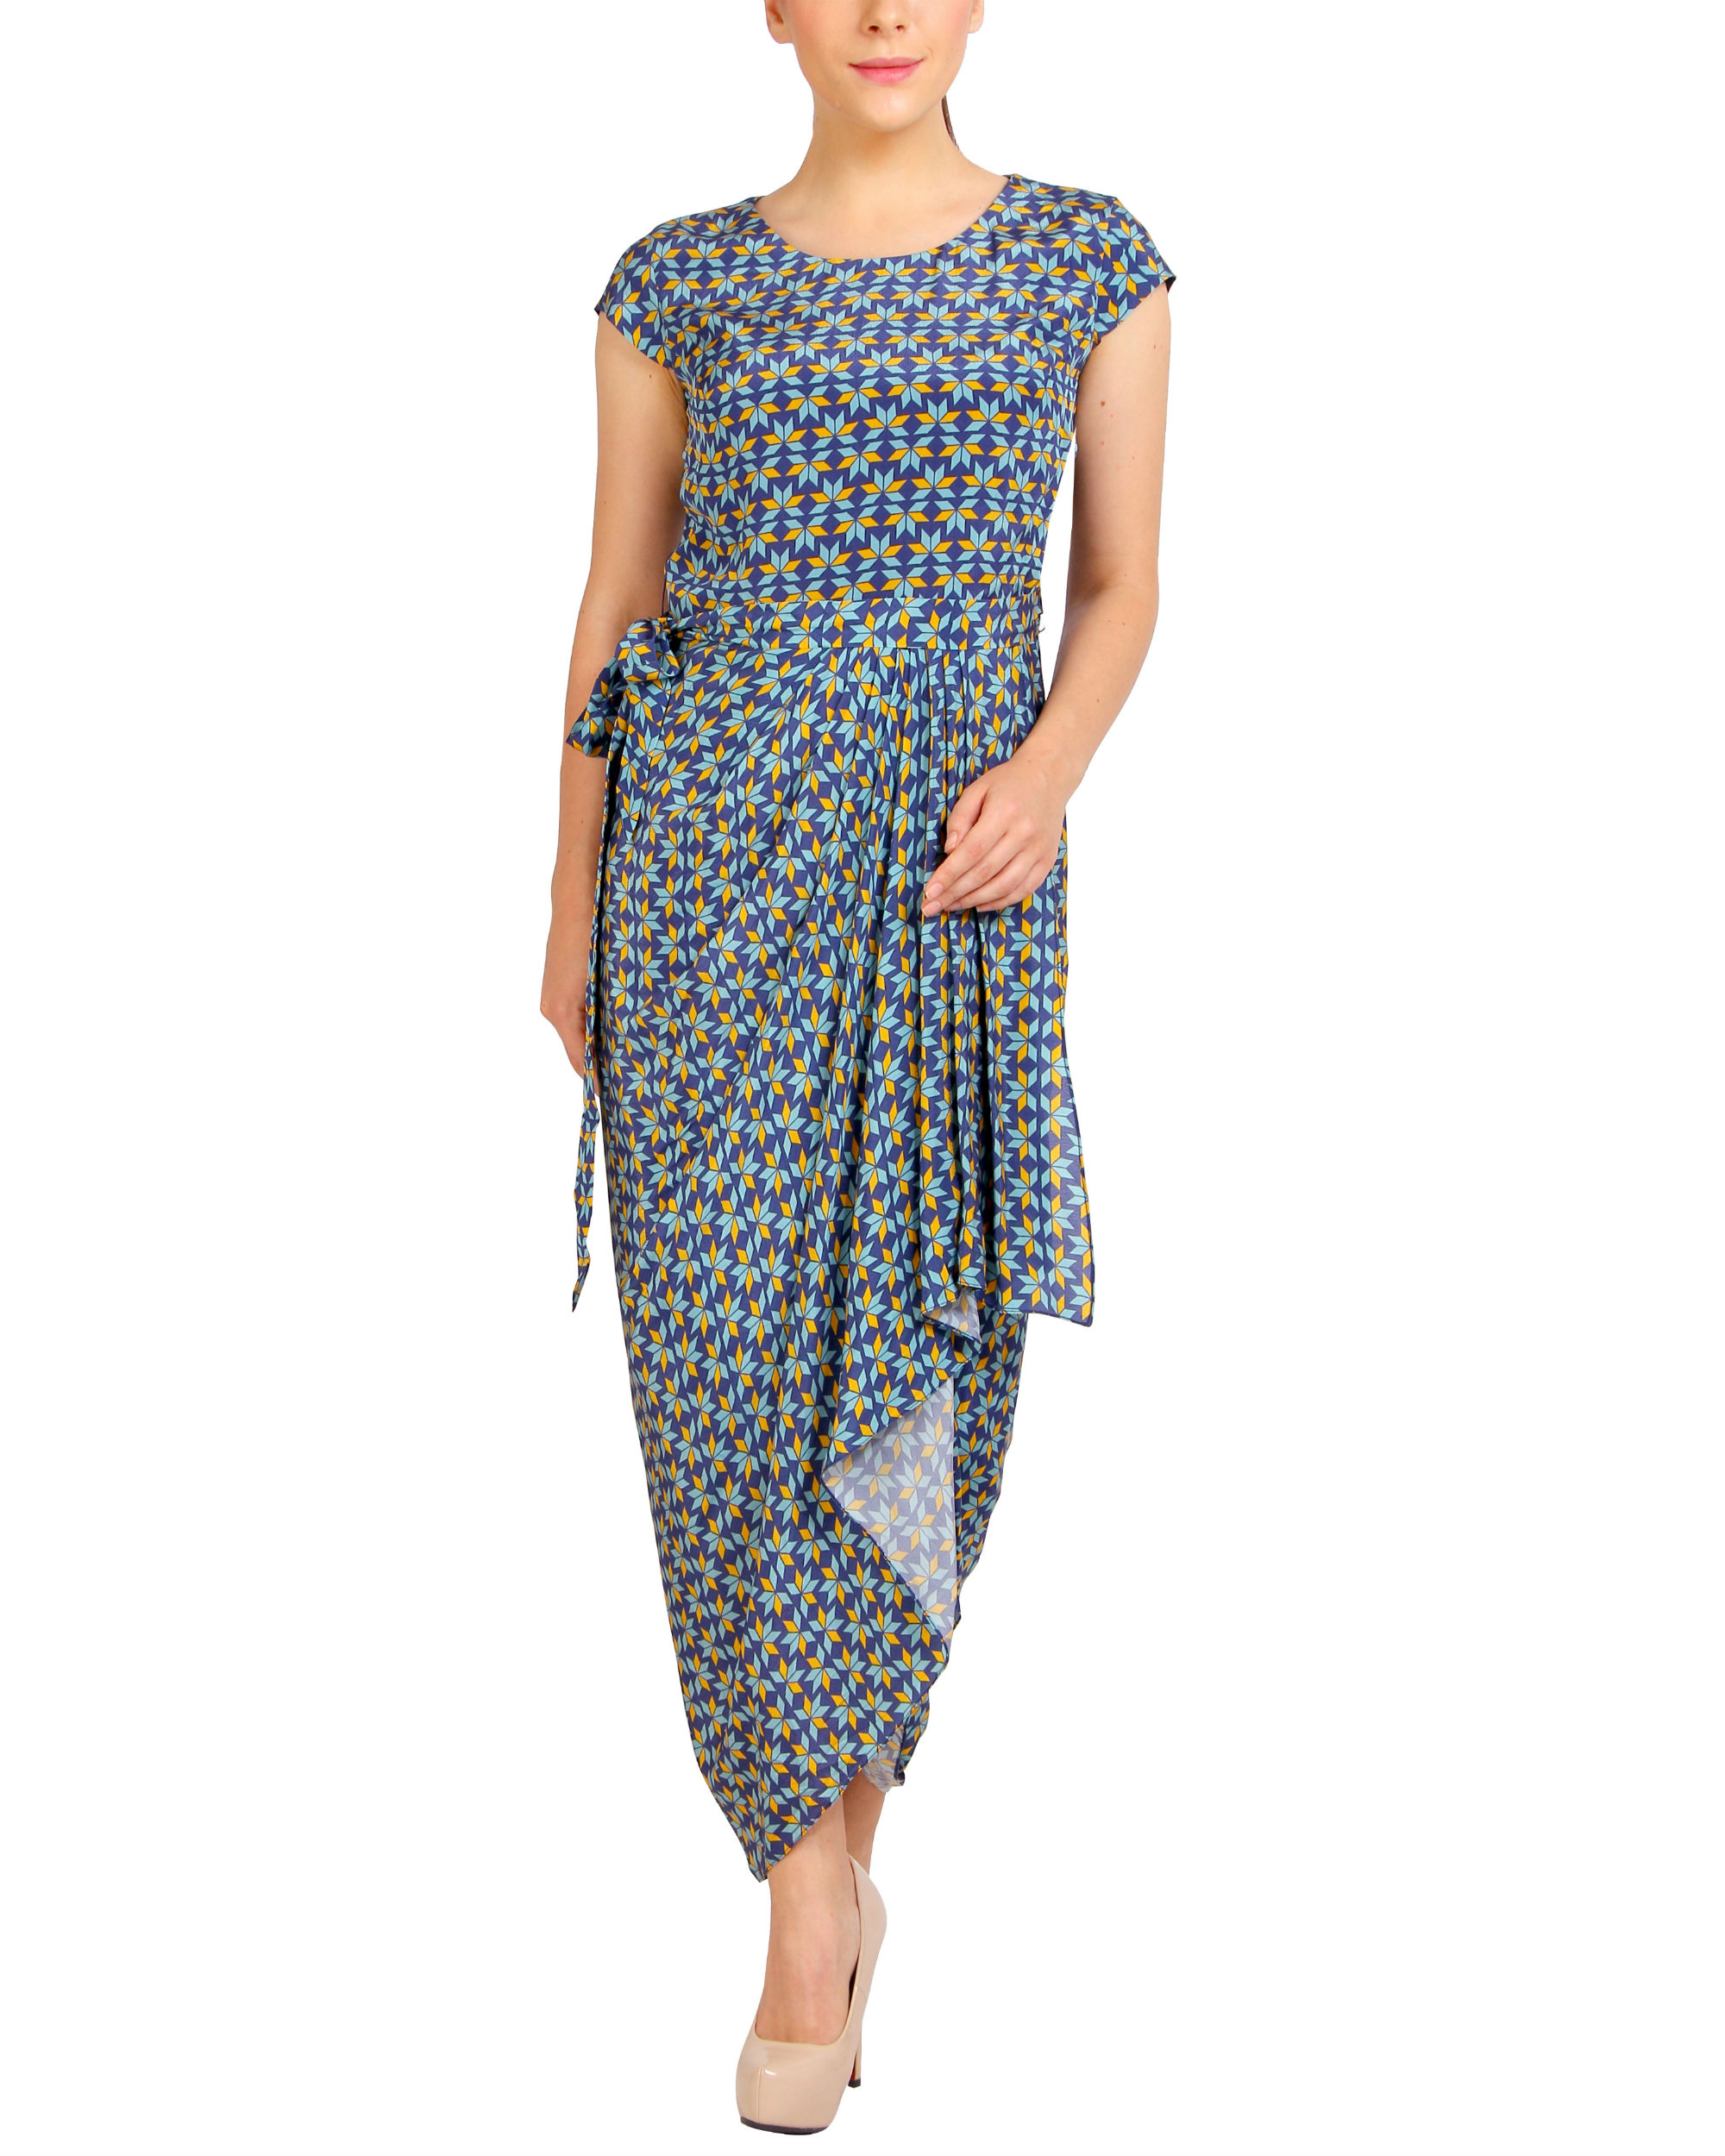 Blue printed dhoti dress